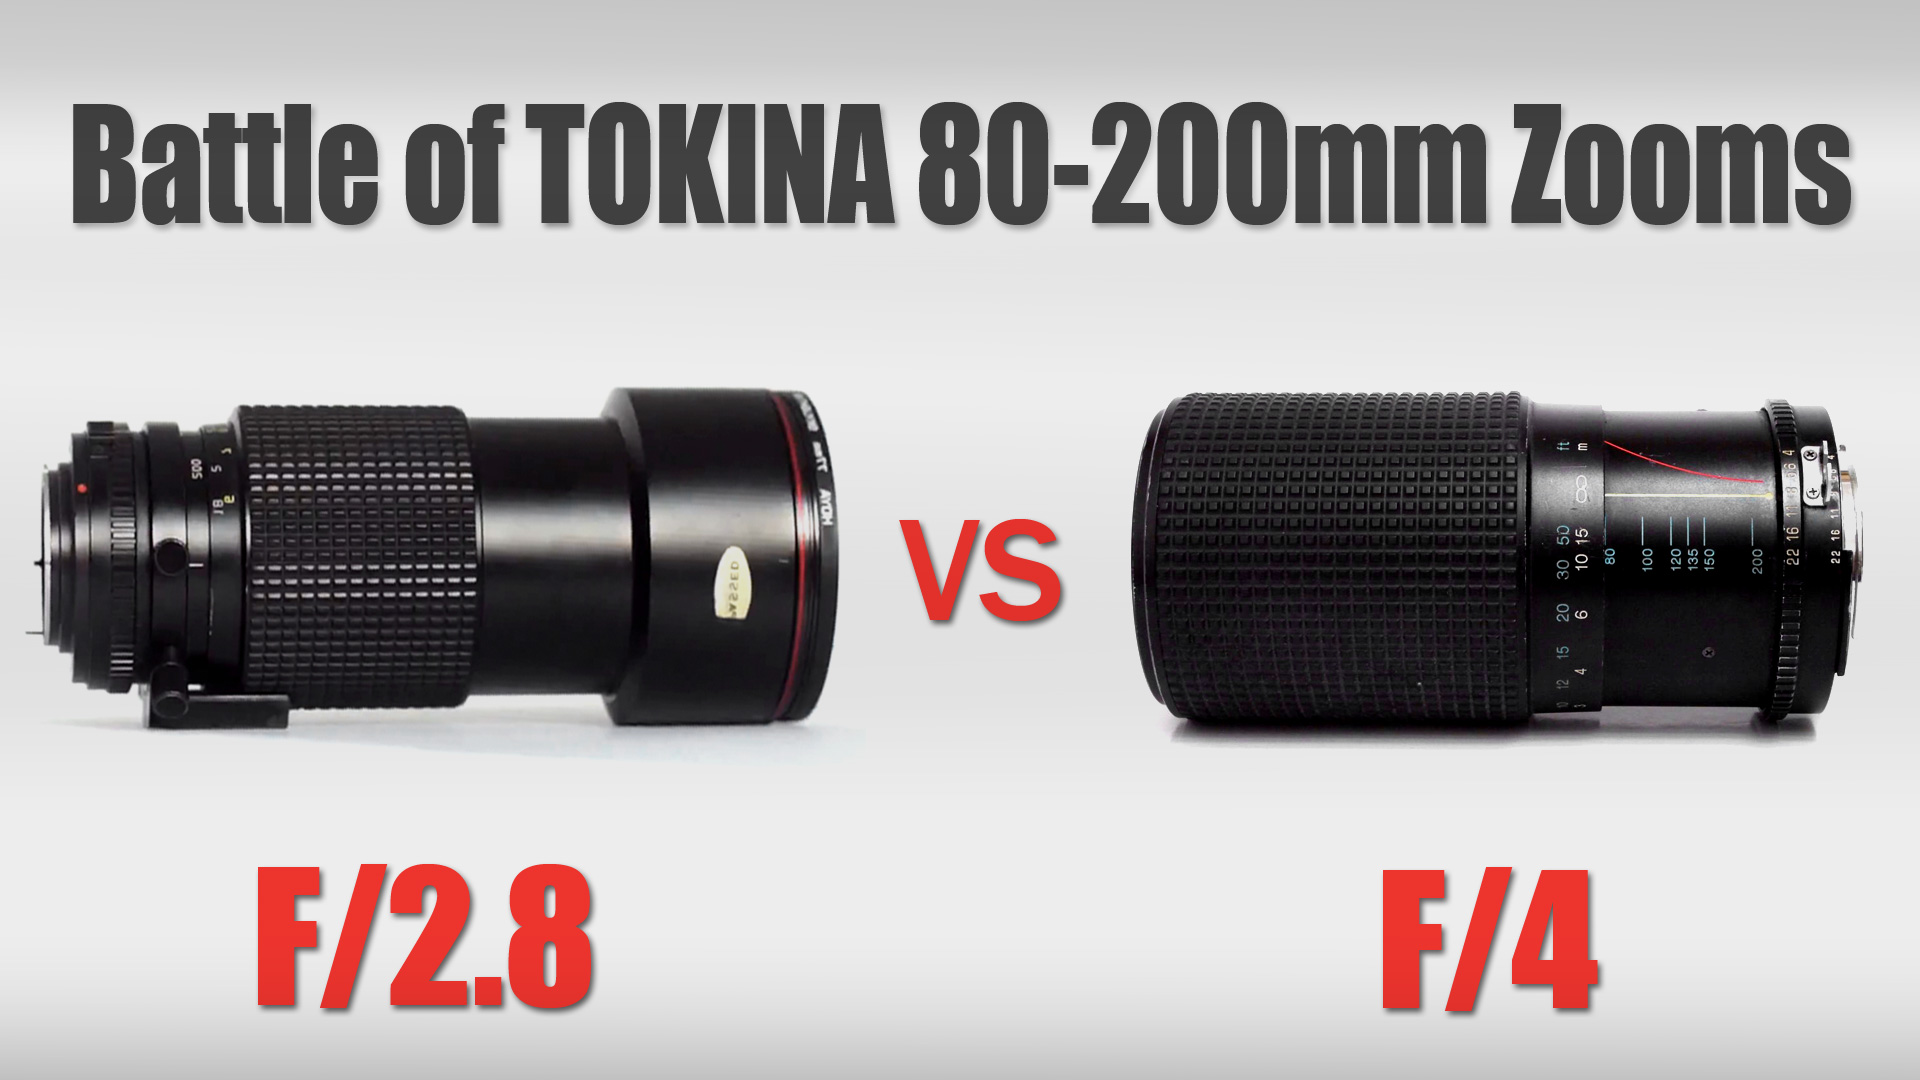 Battle of Tokina 80-200 Zooms | F2.8 vs F4